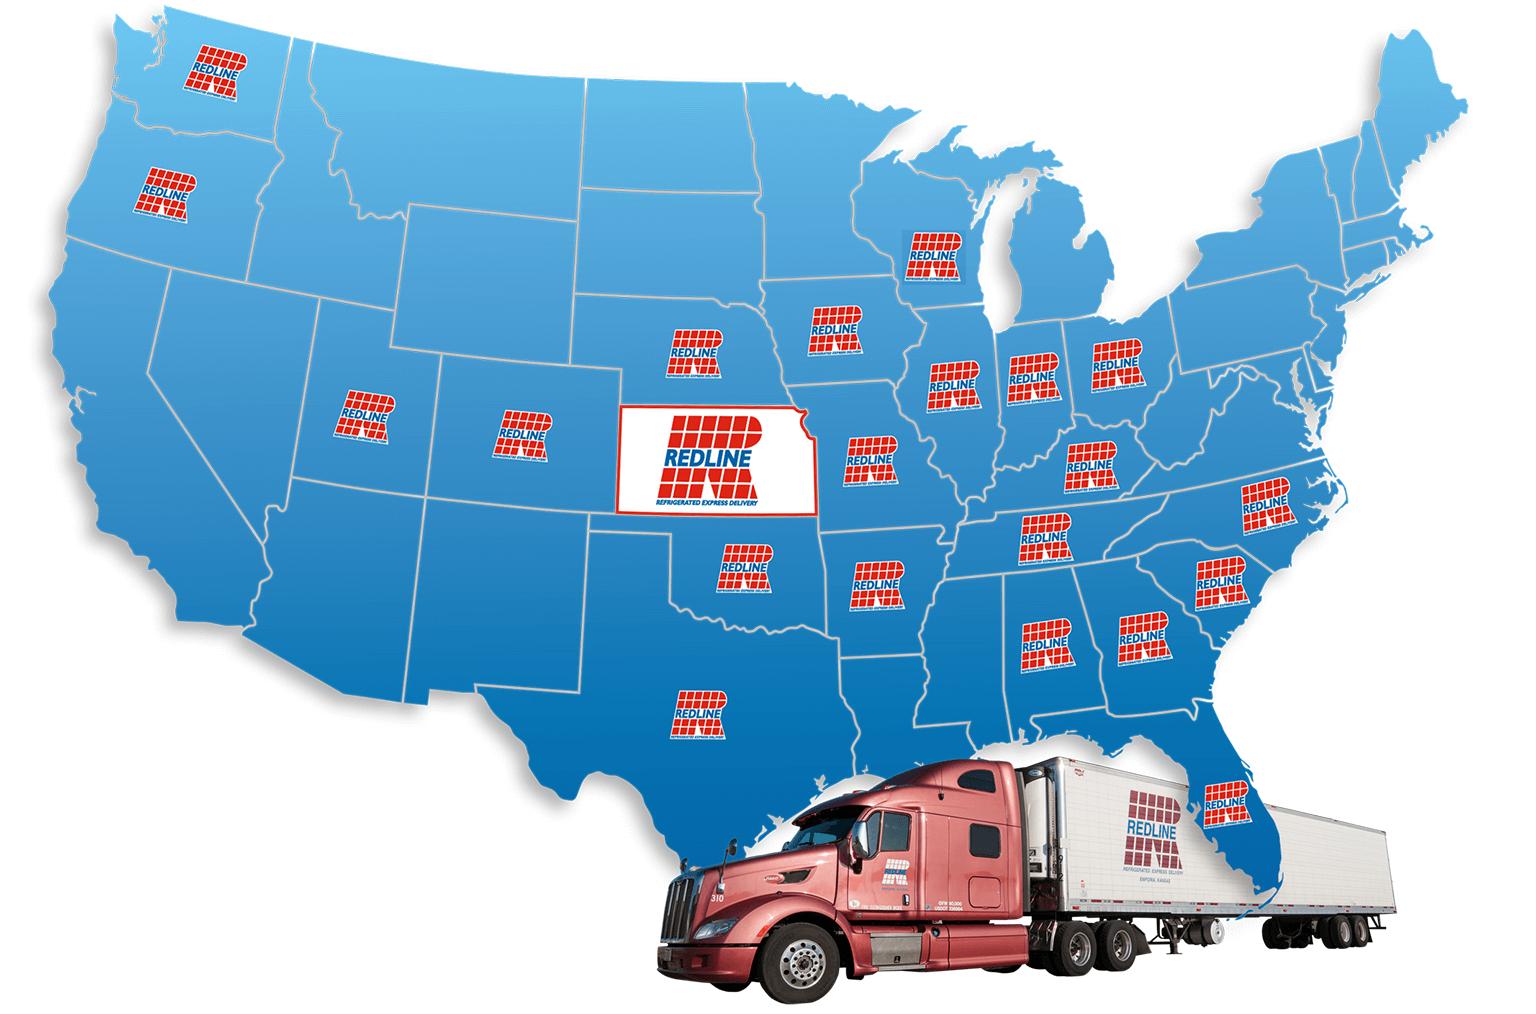 redline-trucking-refrigerated-transport-service-areas